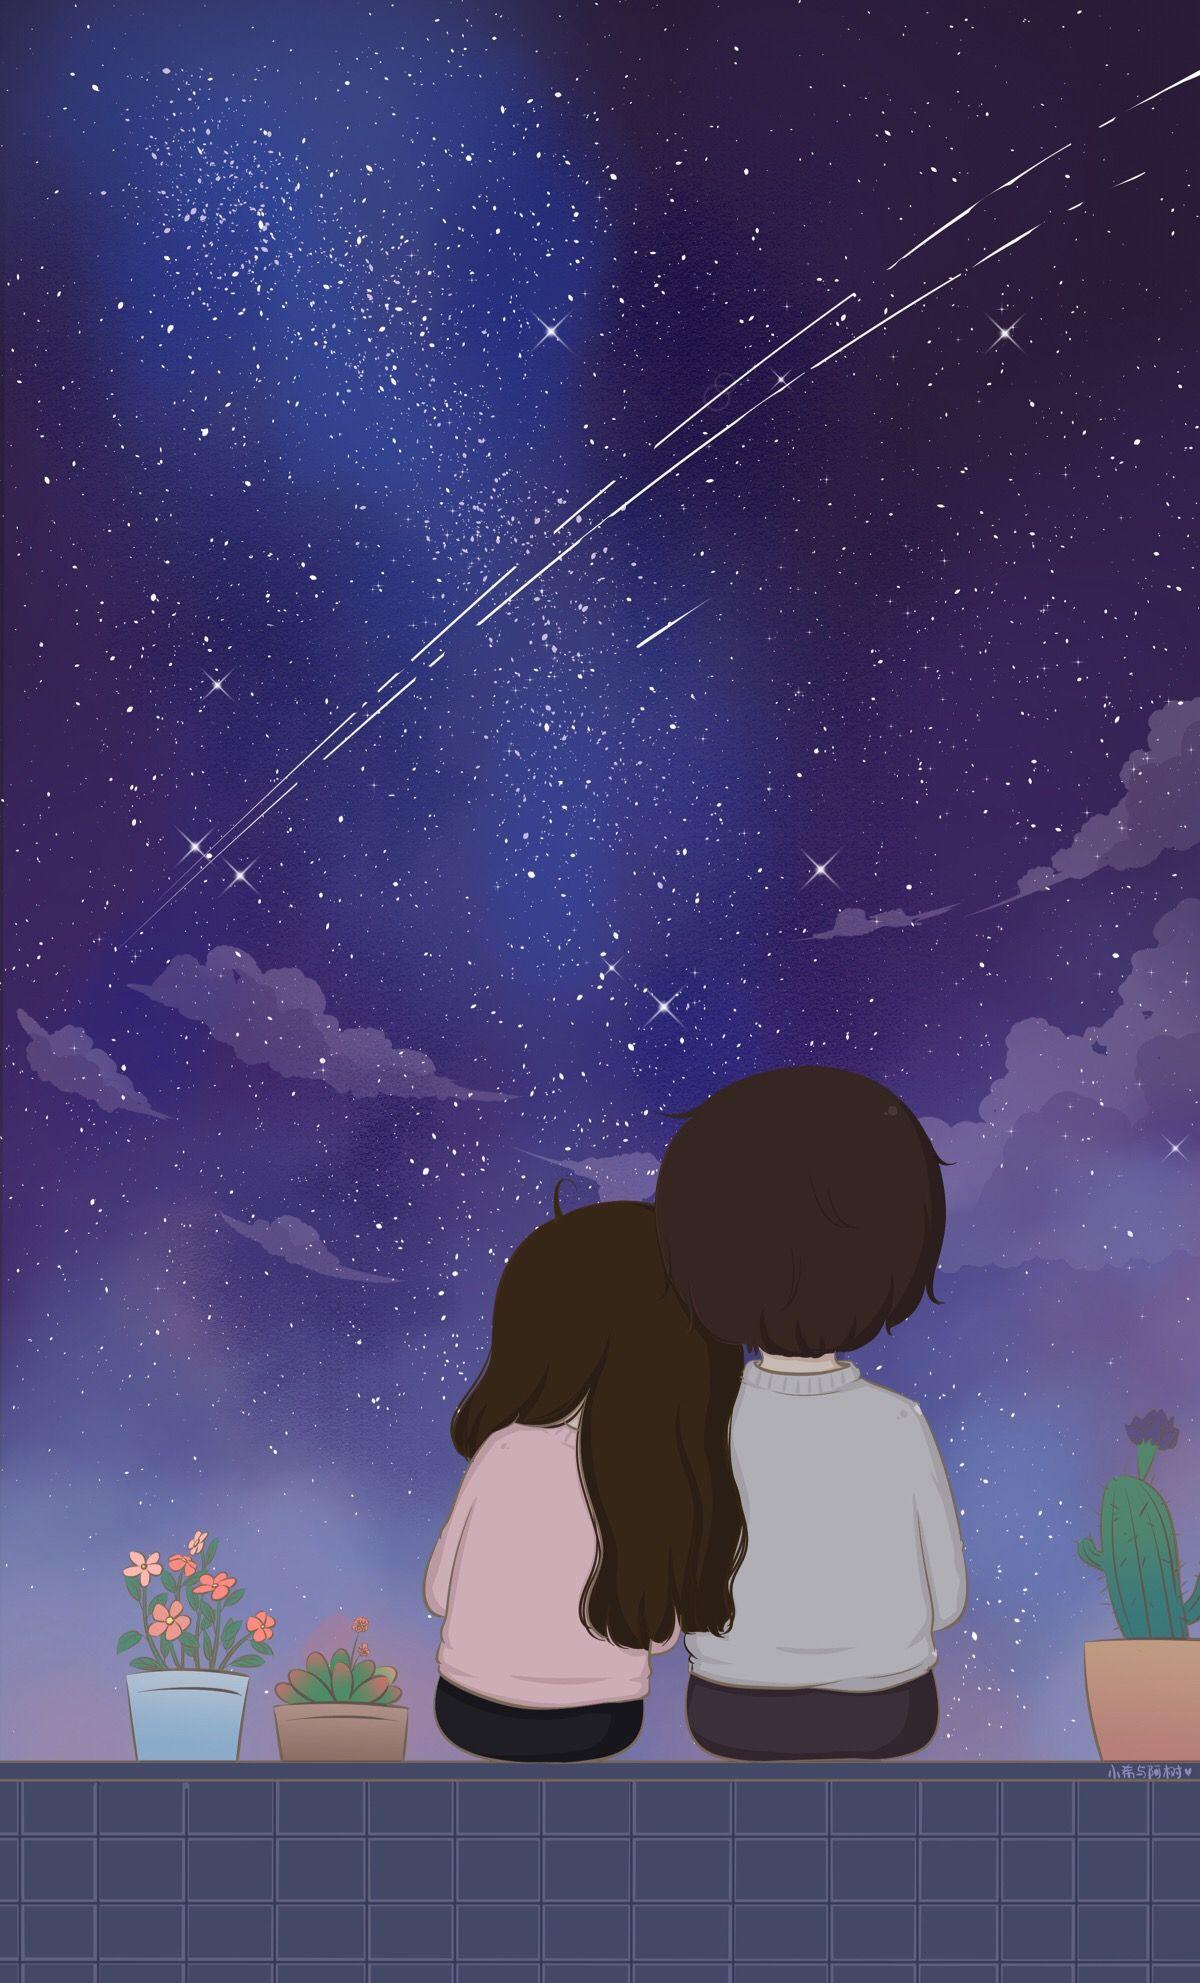 Te Esperando Amorzinho Cute Couple Wallpaper Love Couple Wallpaper Romantic Anime